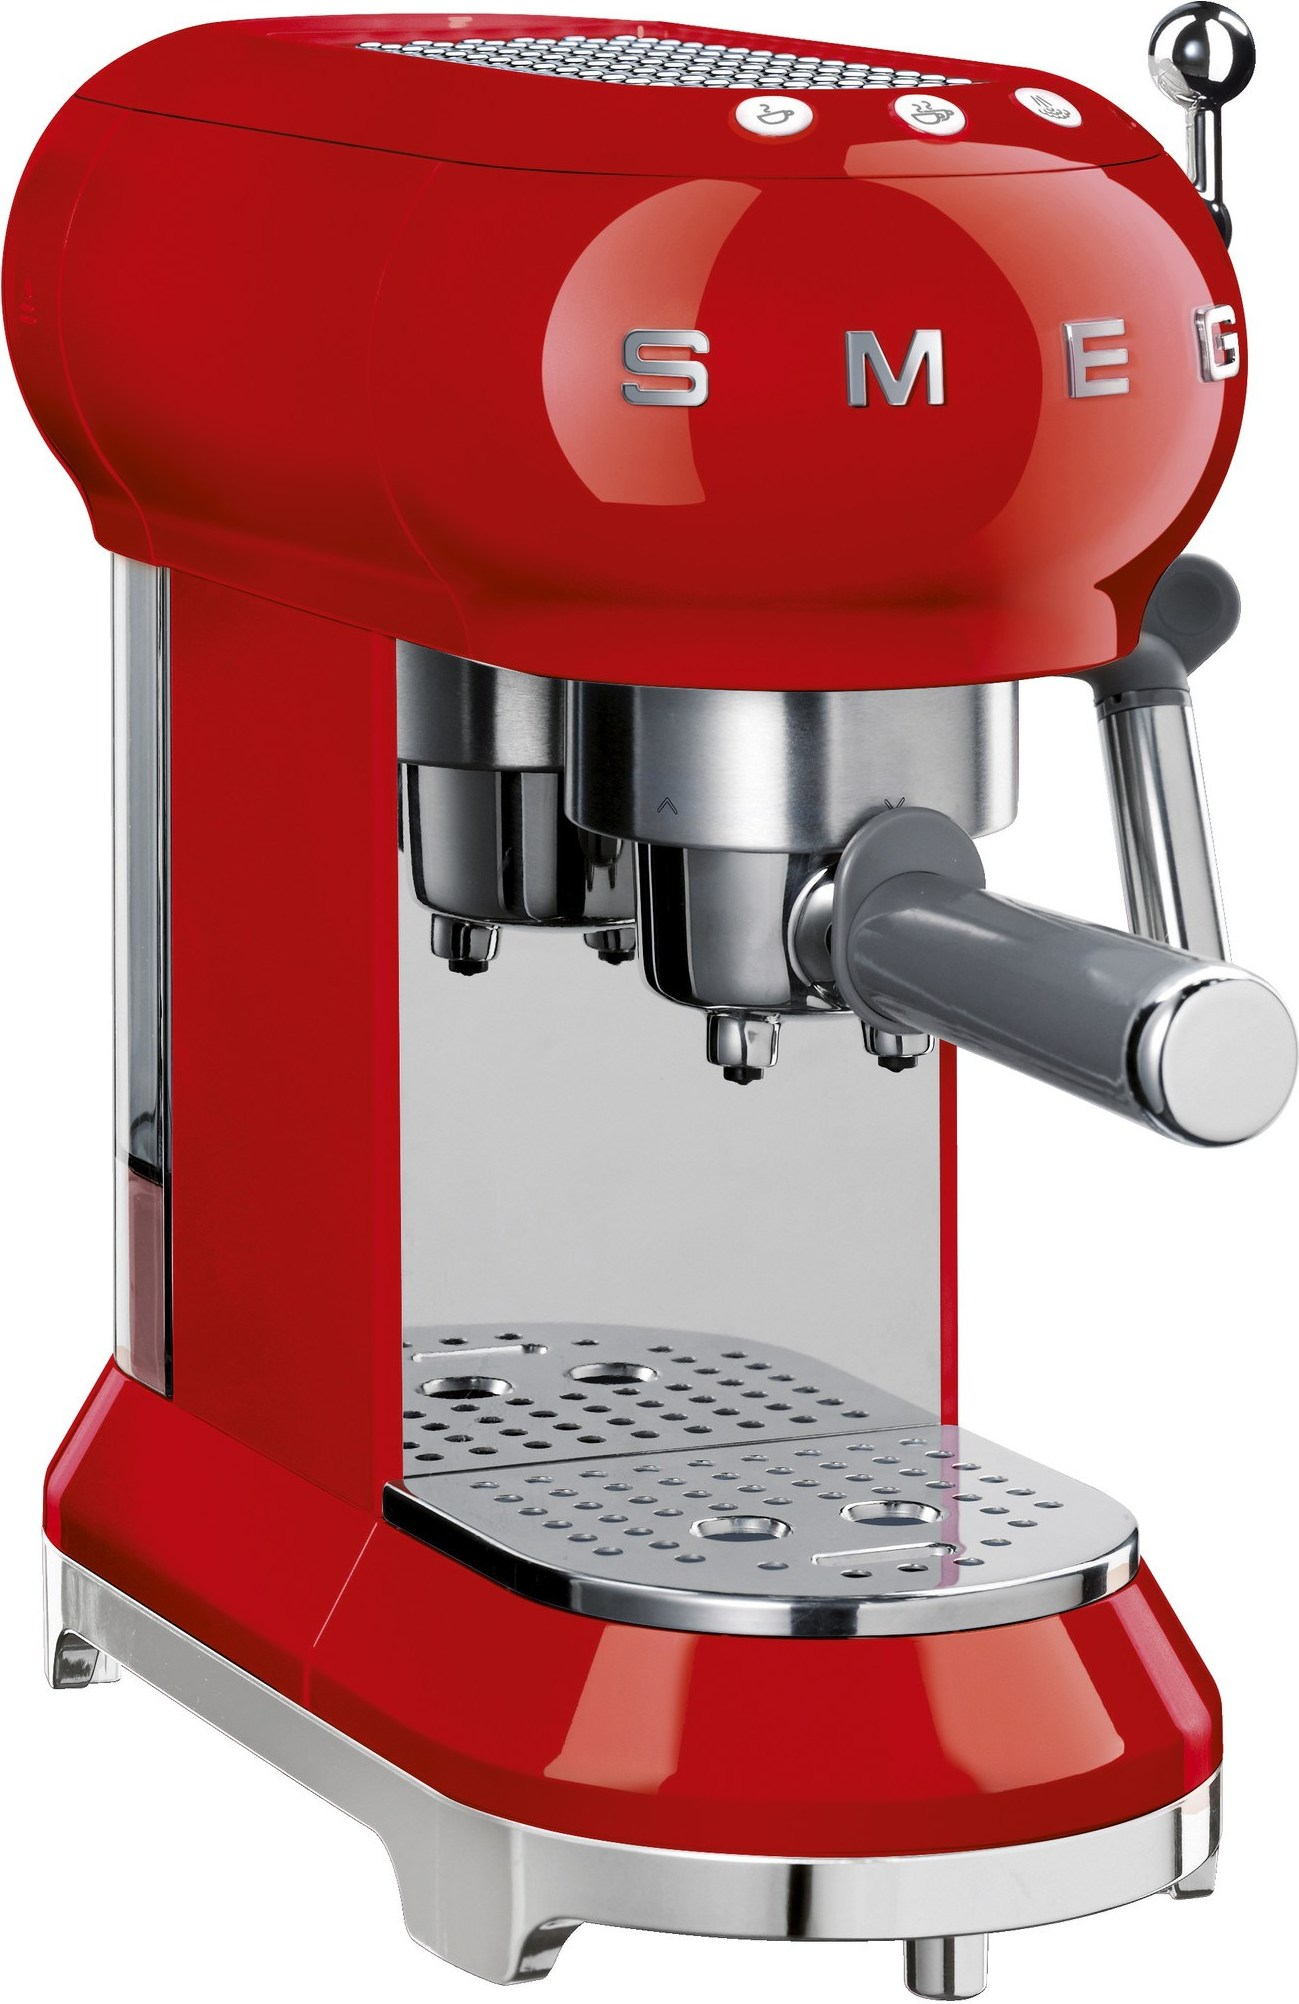 ekspres do kawy 50 39 s style czerwony smeg ecf01rdeu. Black Bedroom Furniture Sets. Home Design Ideas